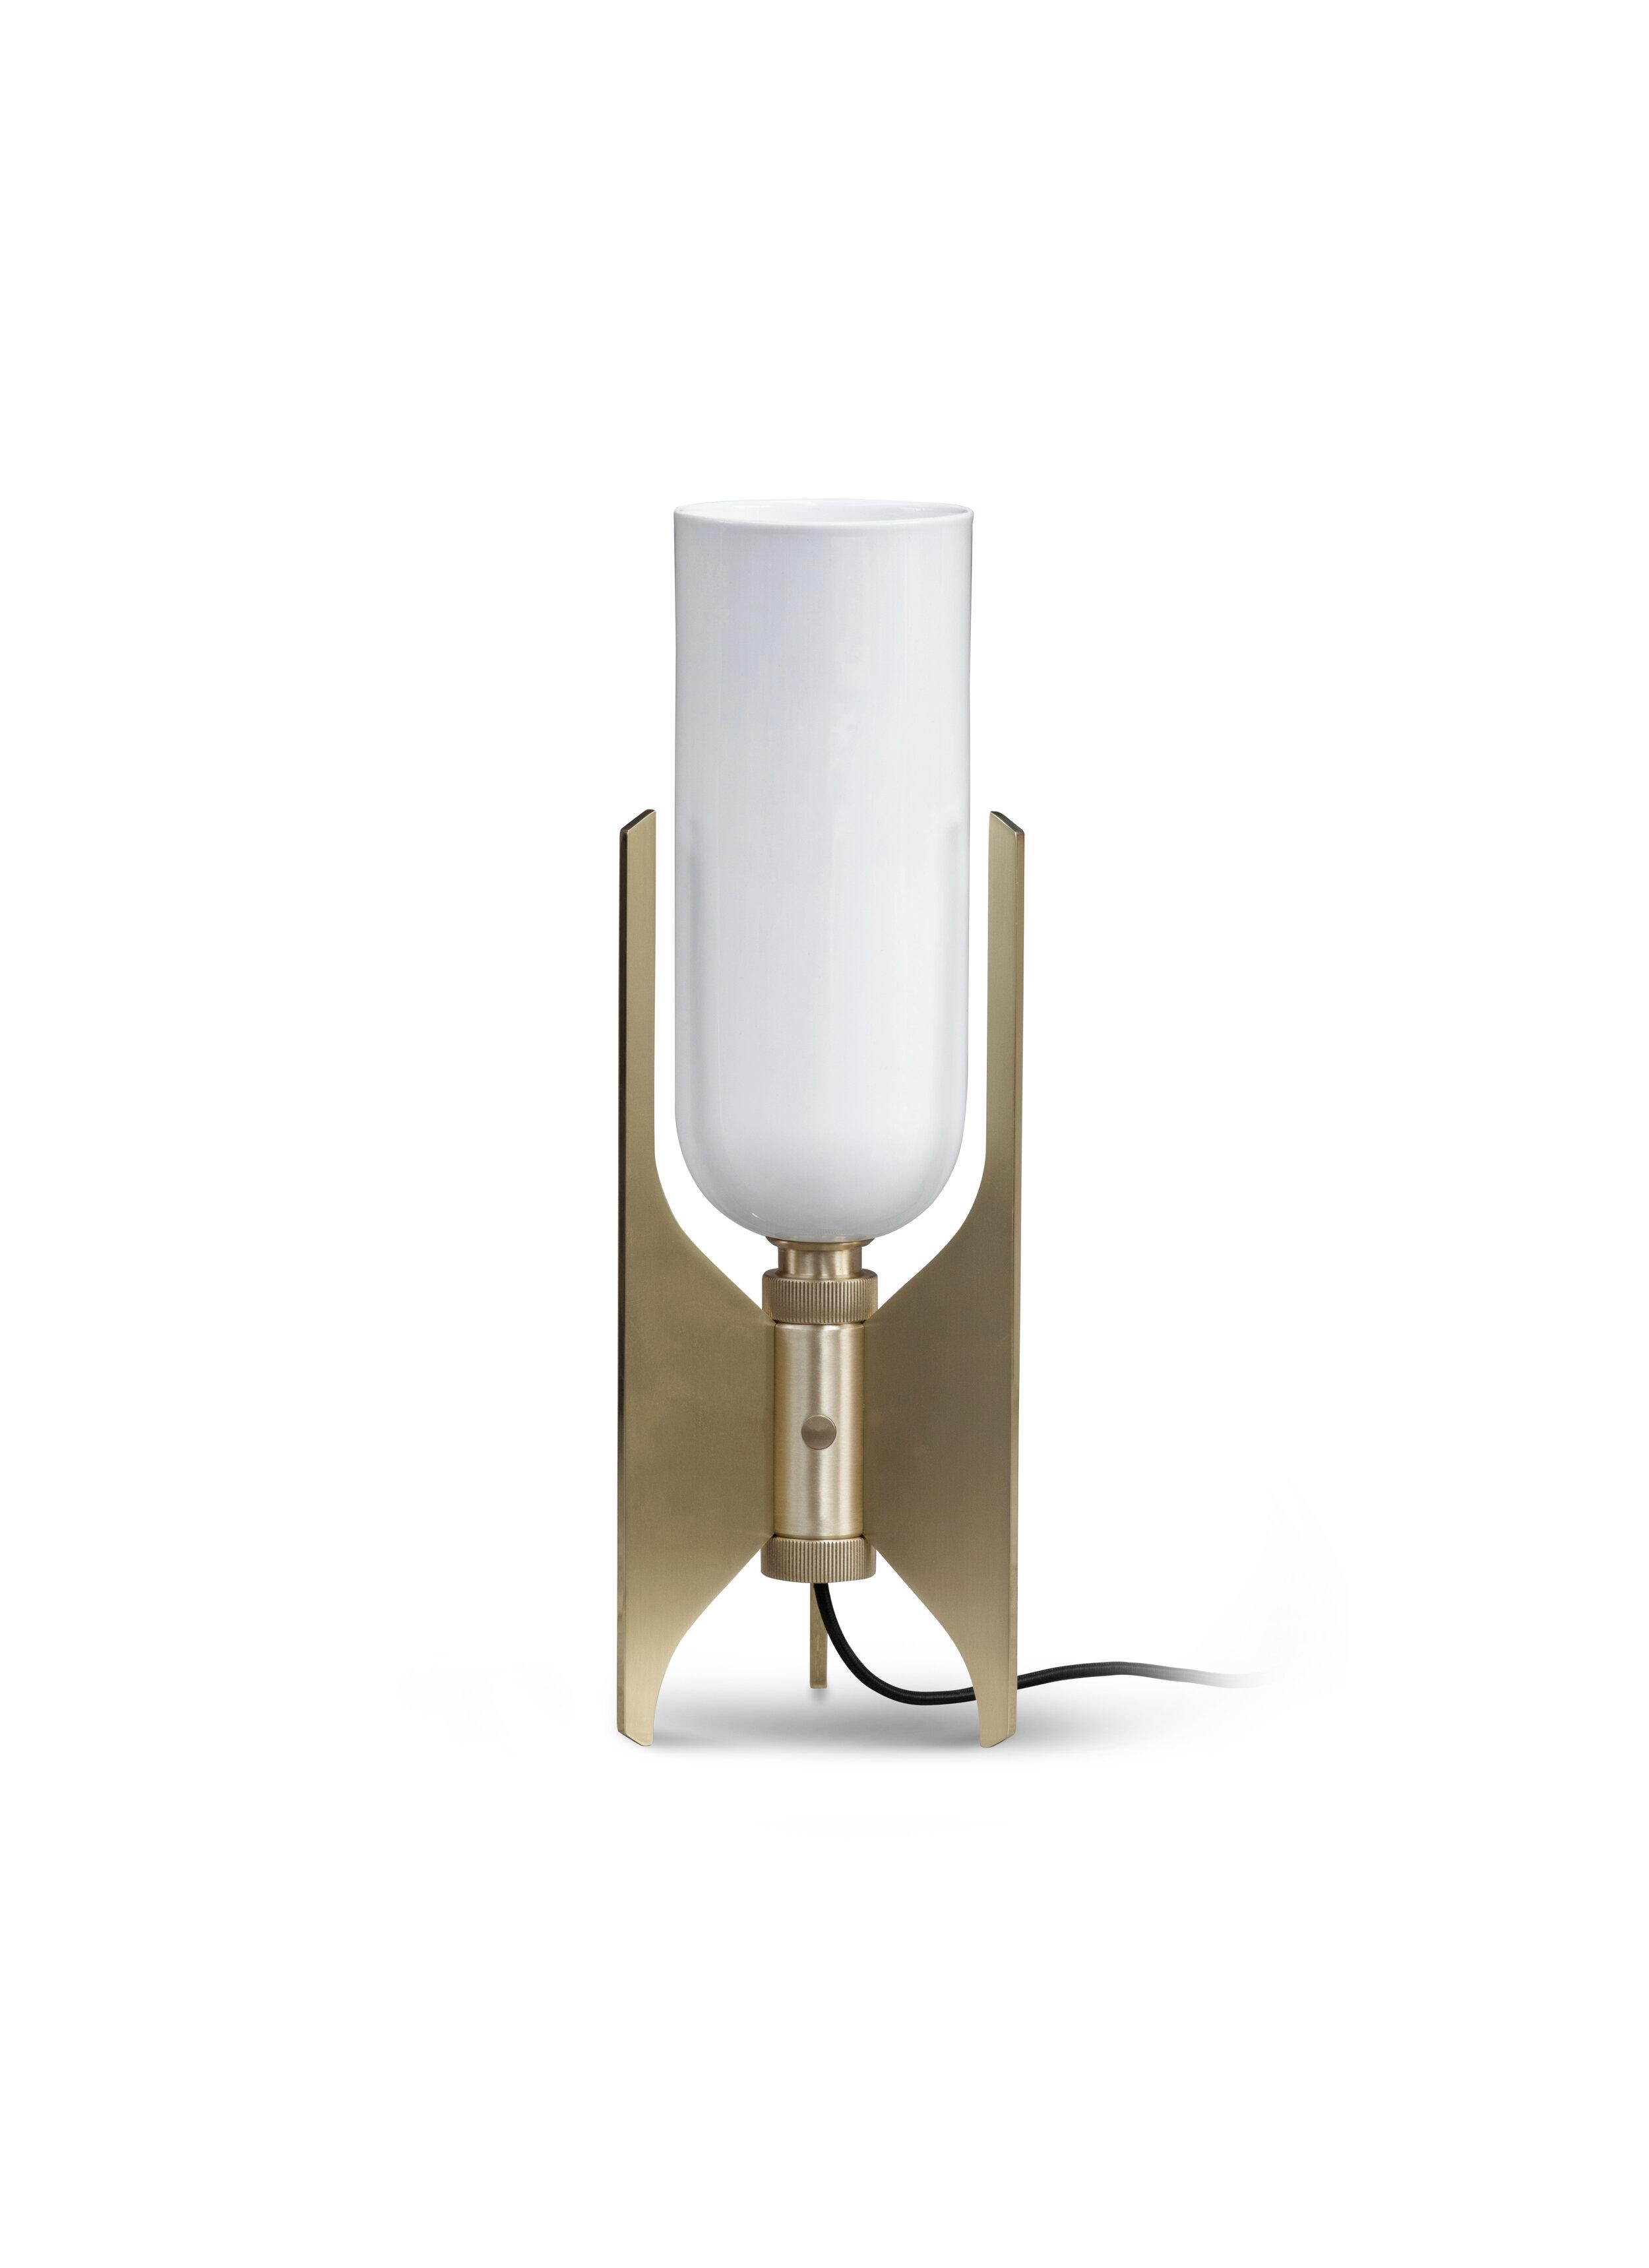 Pennon_lamp_brass.jpg